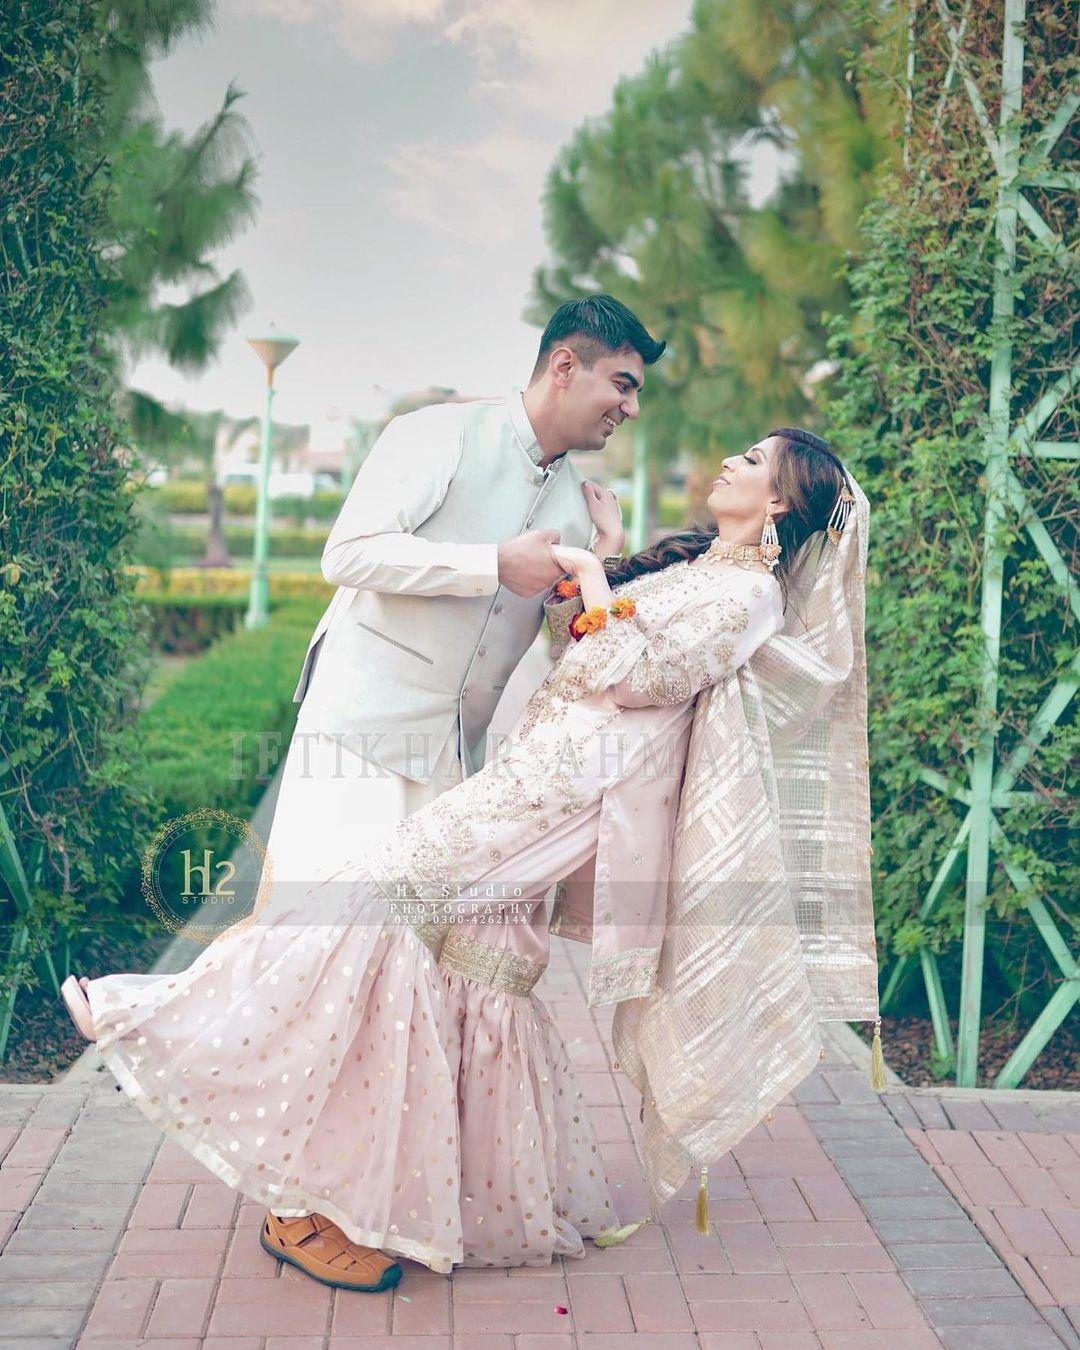 Kitchen With Amna Wedding Pics - Exclusive